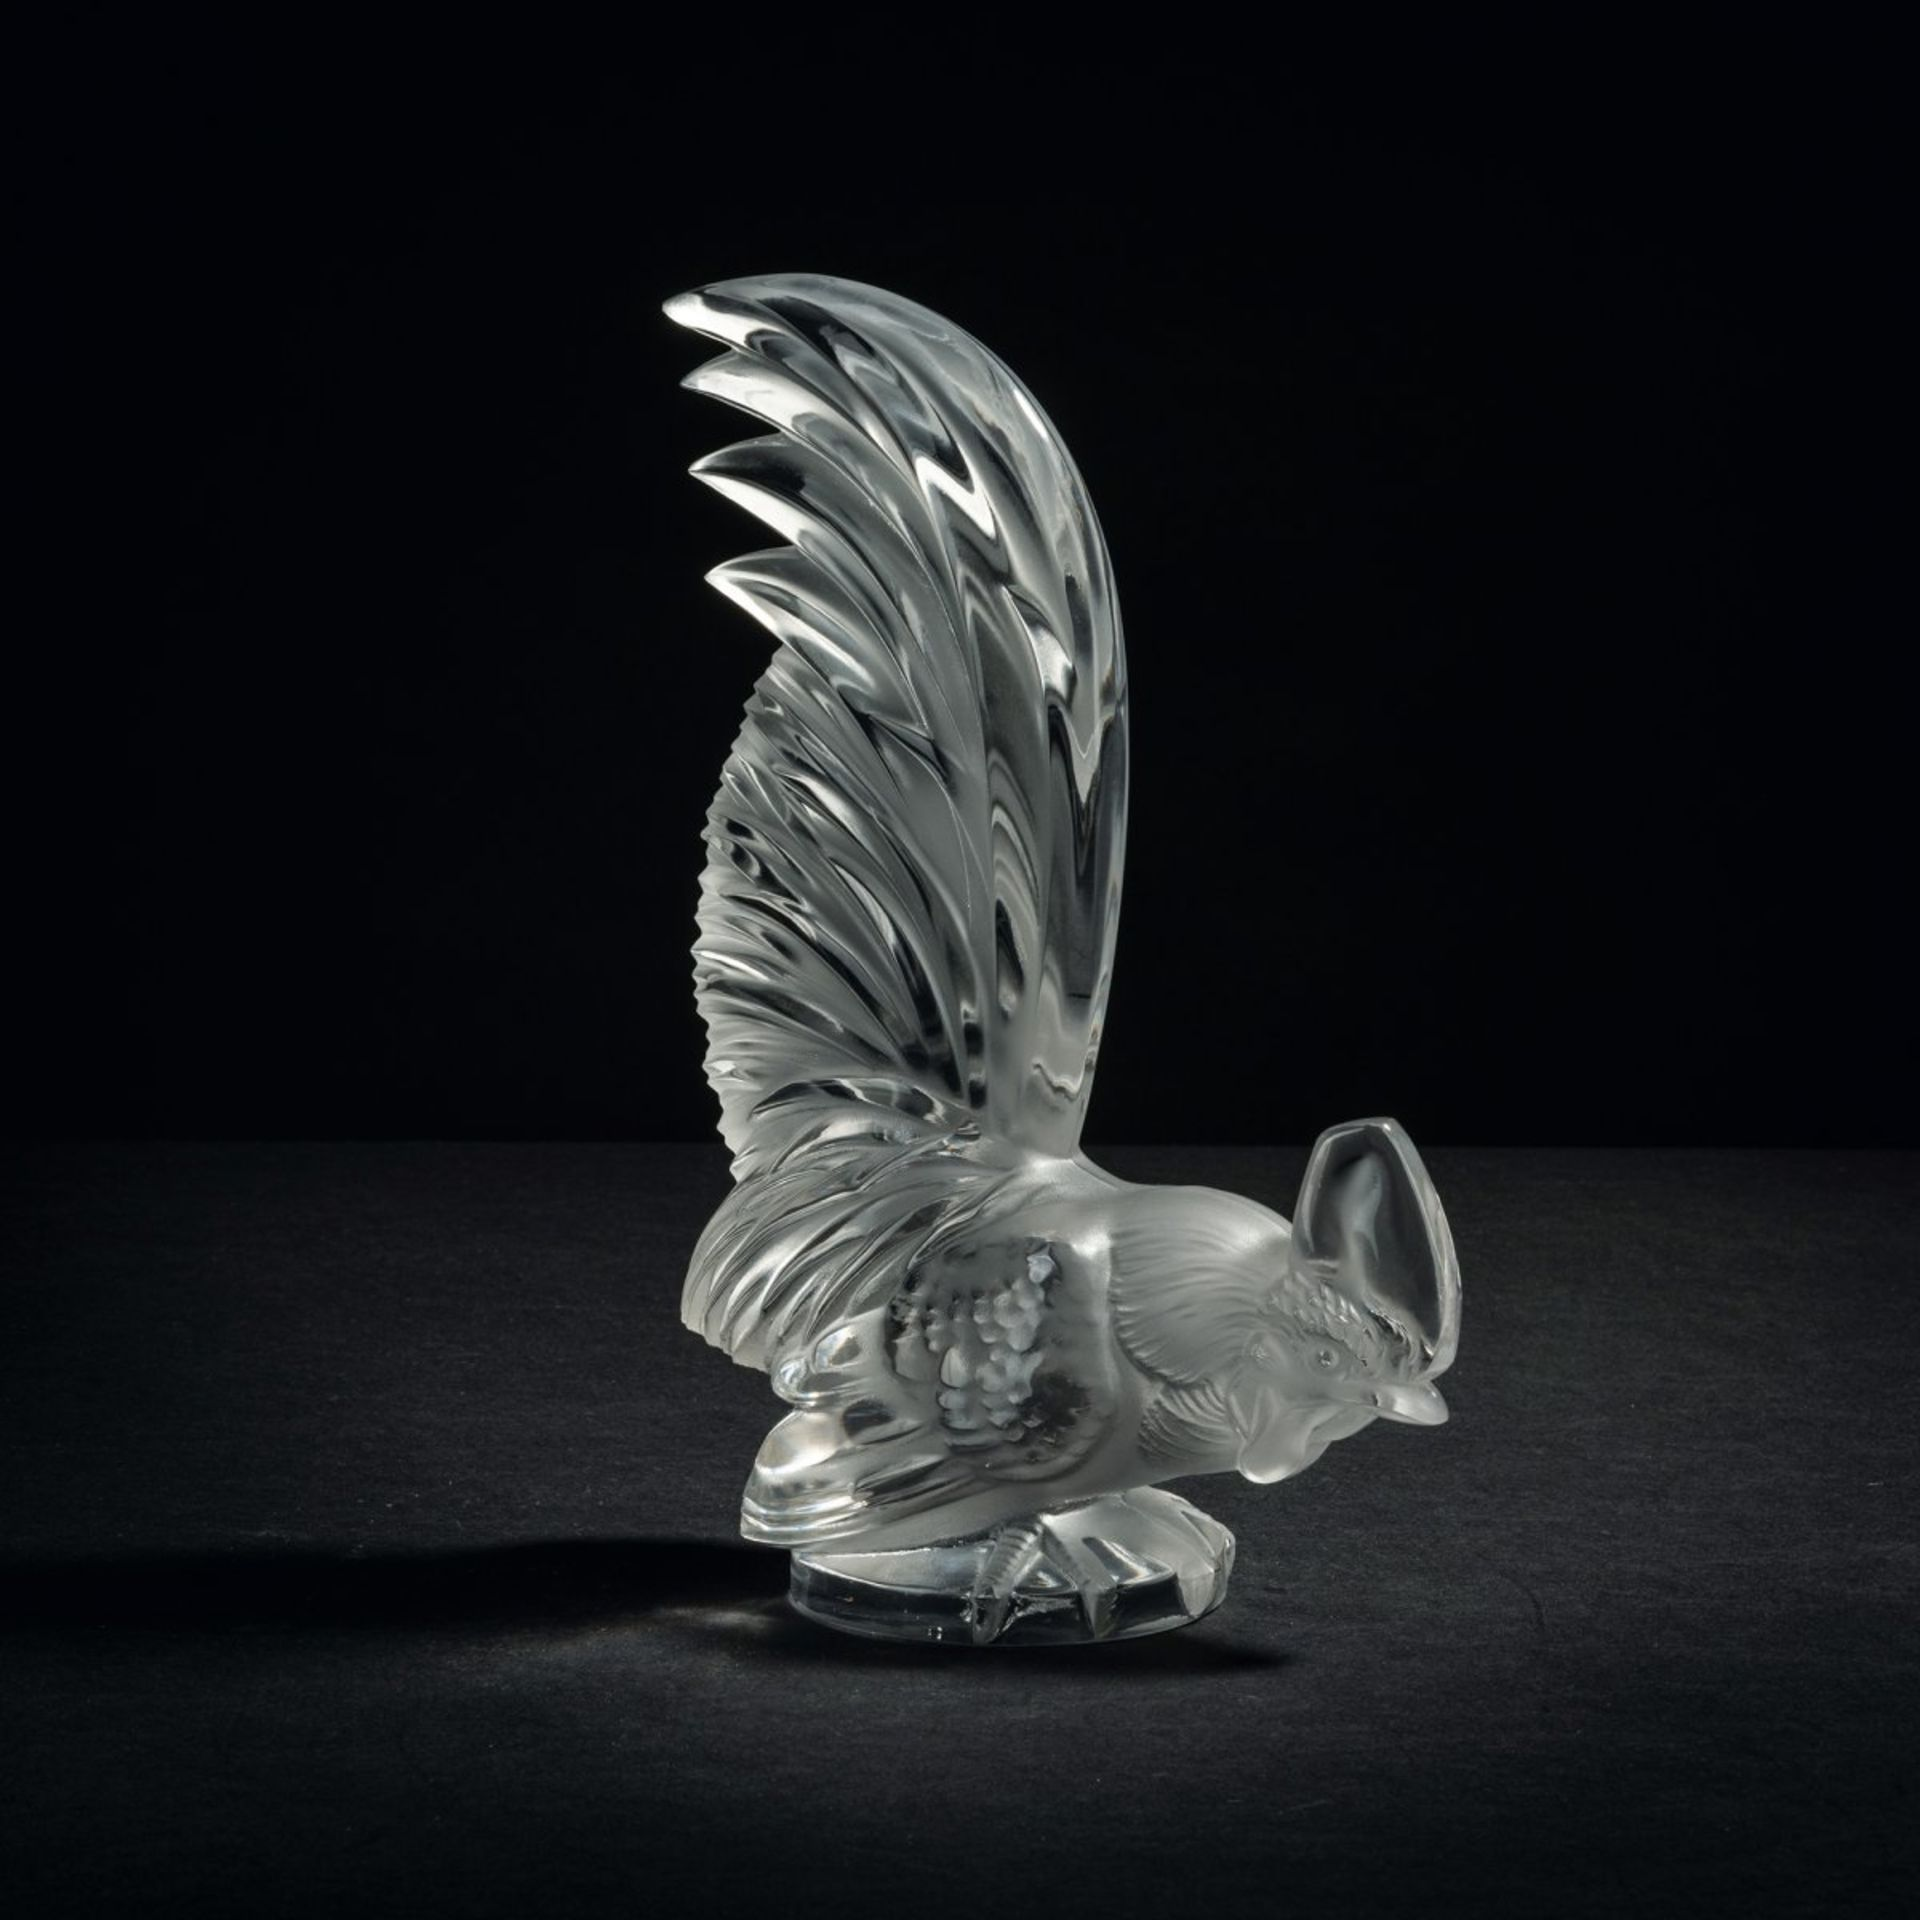 René Lalique, Briefbeschwerer 'Coq nain', 1928